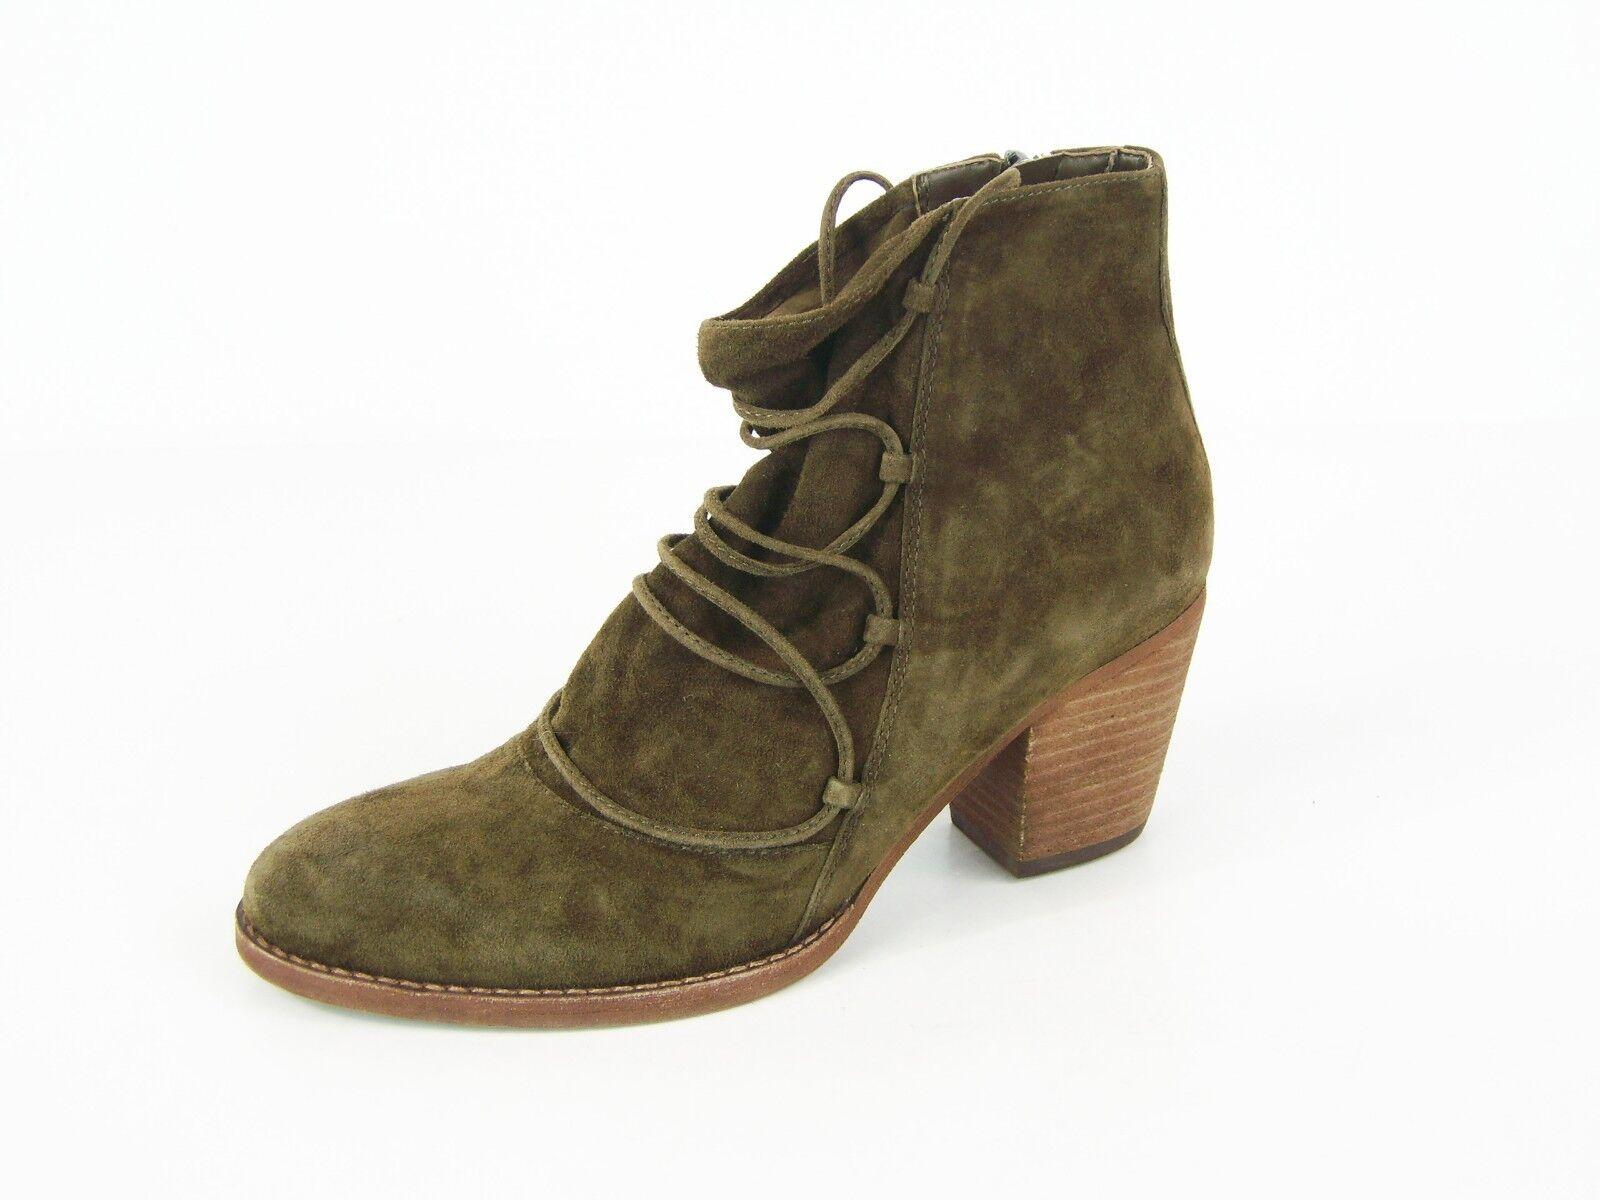 Sam Edelman Millard Ankle Boot - Deep Moss Suede - Sz 8 M